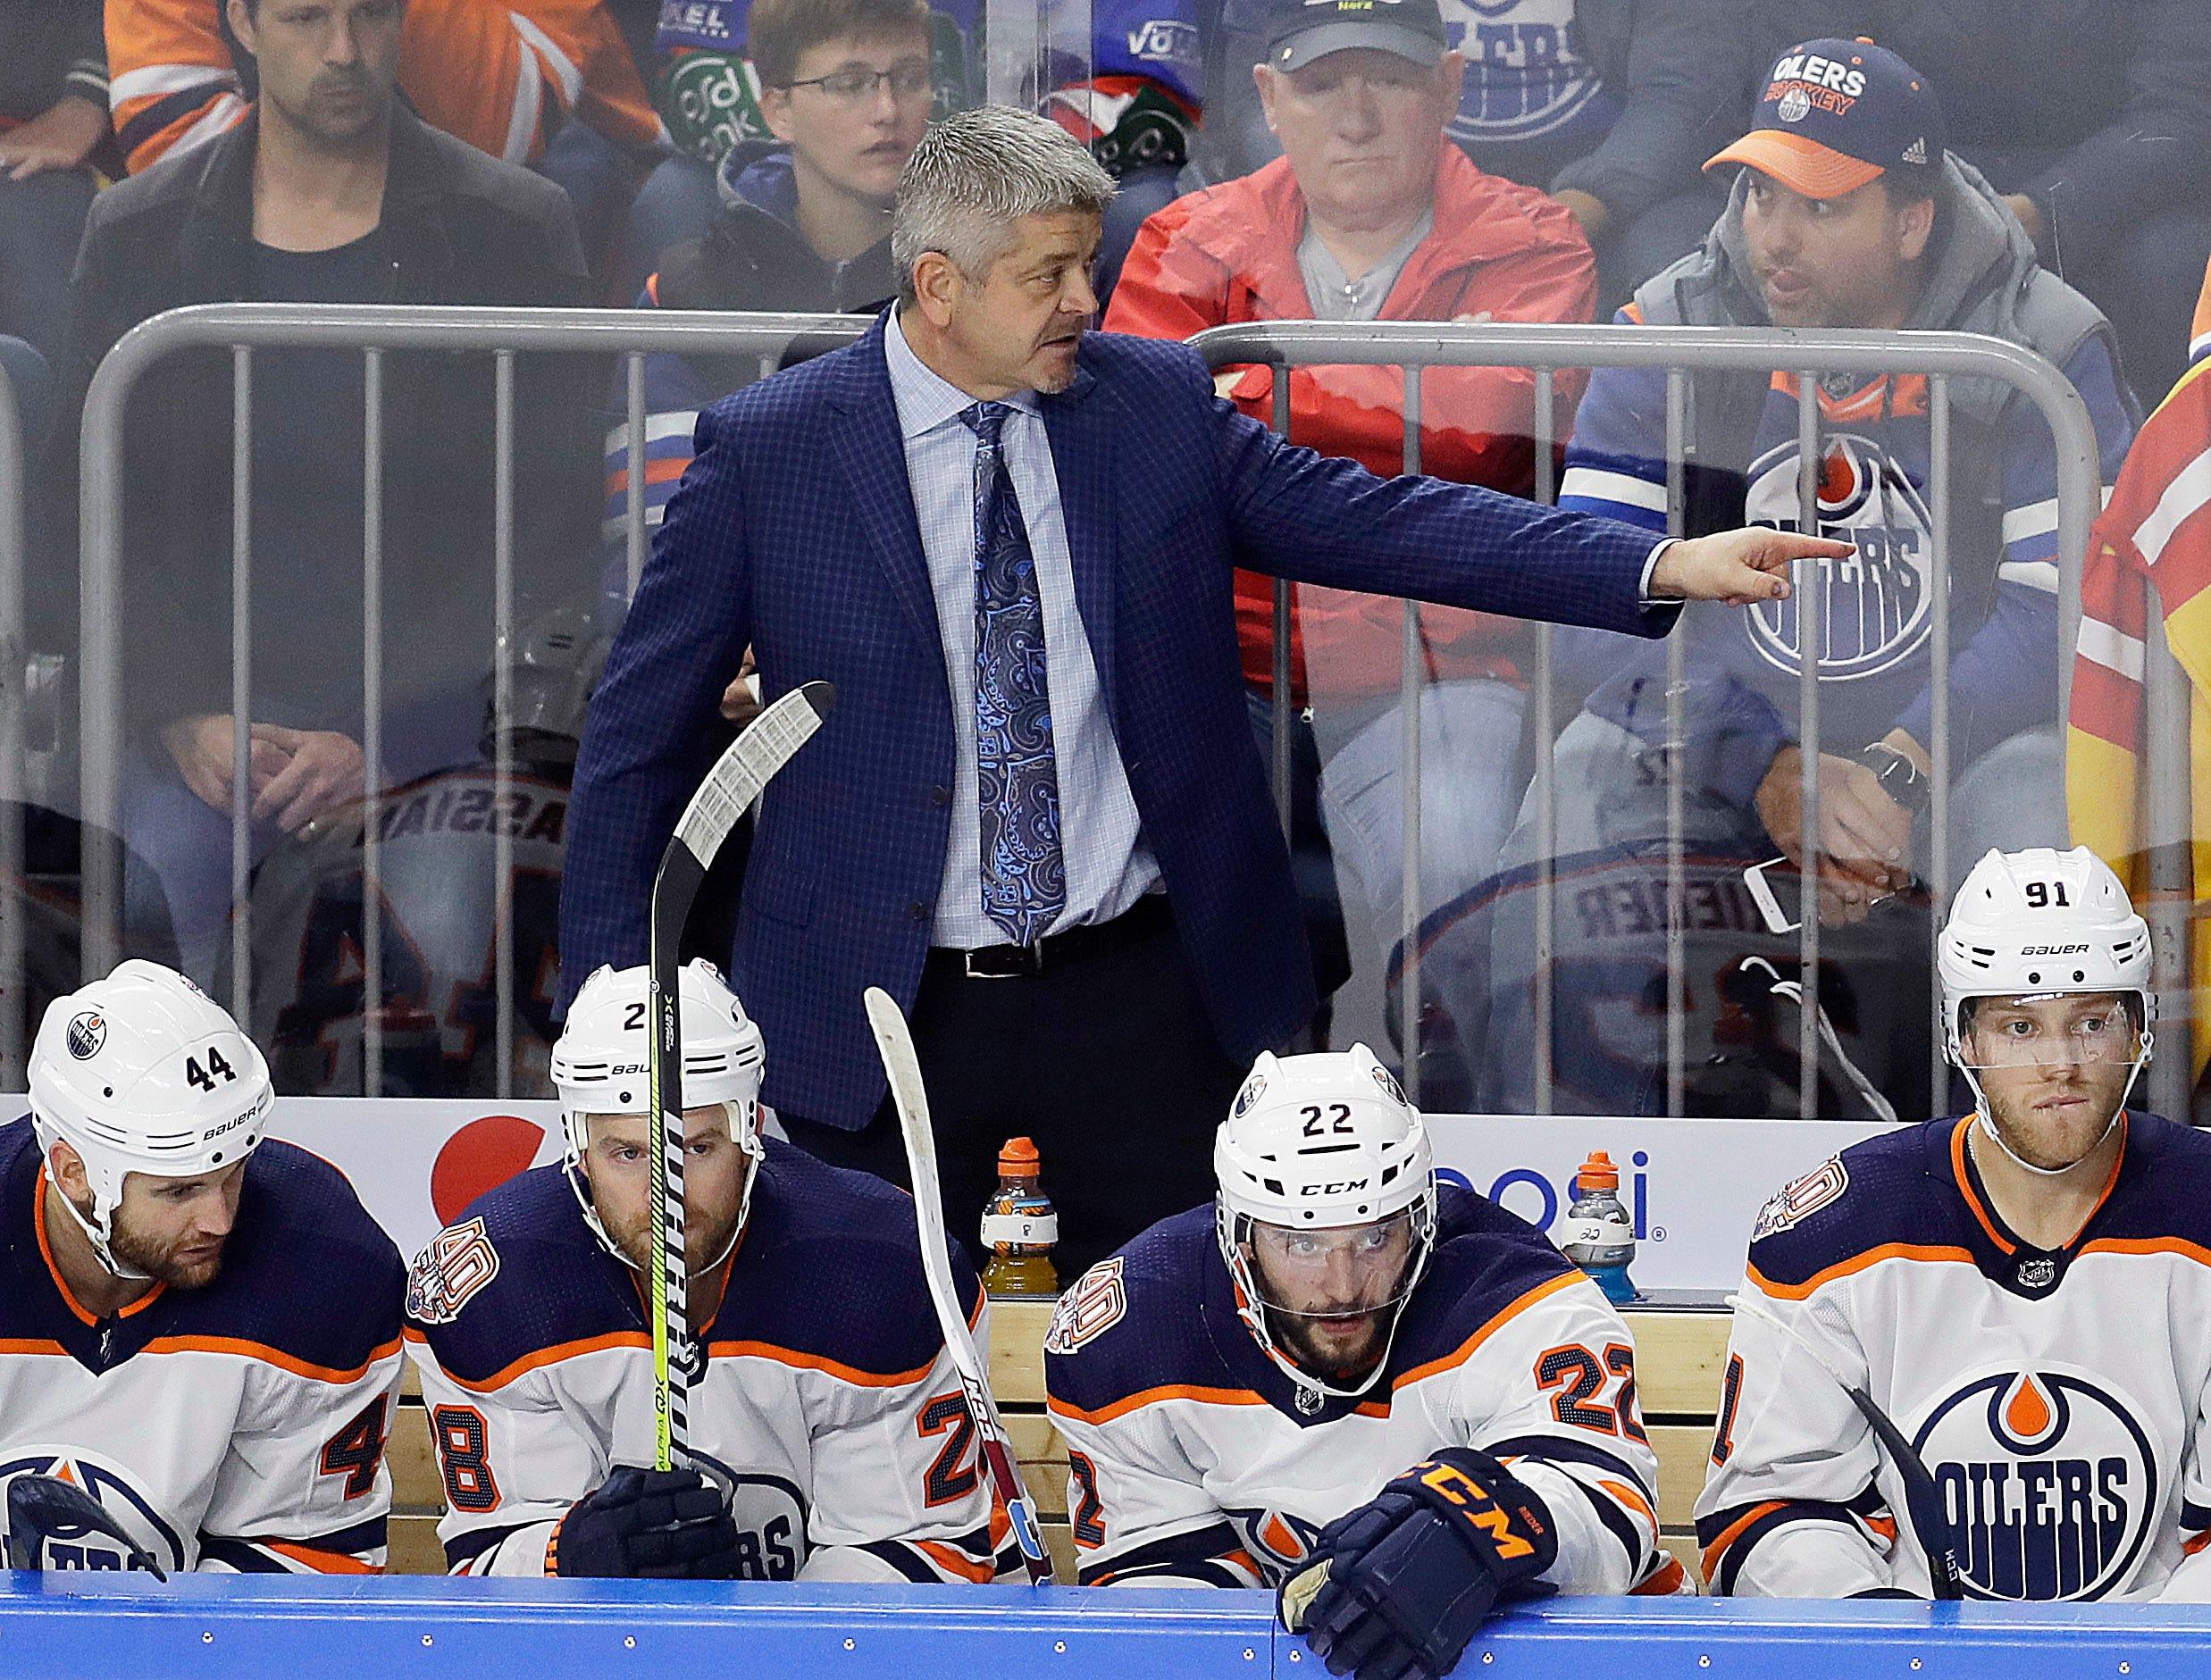 Edmonton Oilers edge Cologne 4-3 in OT in exhibition game